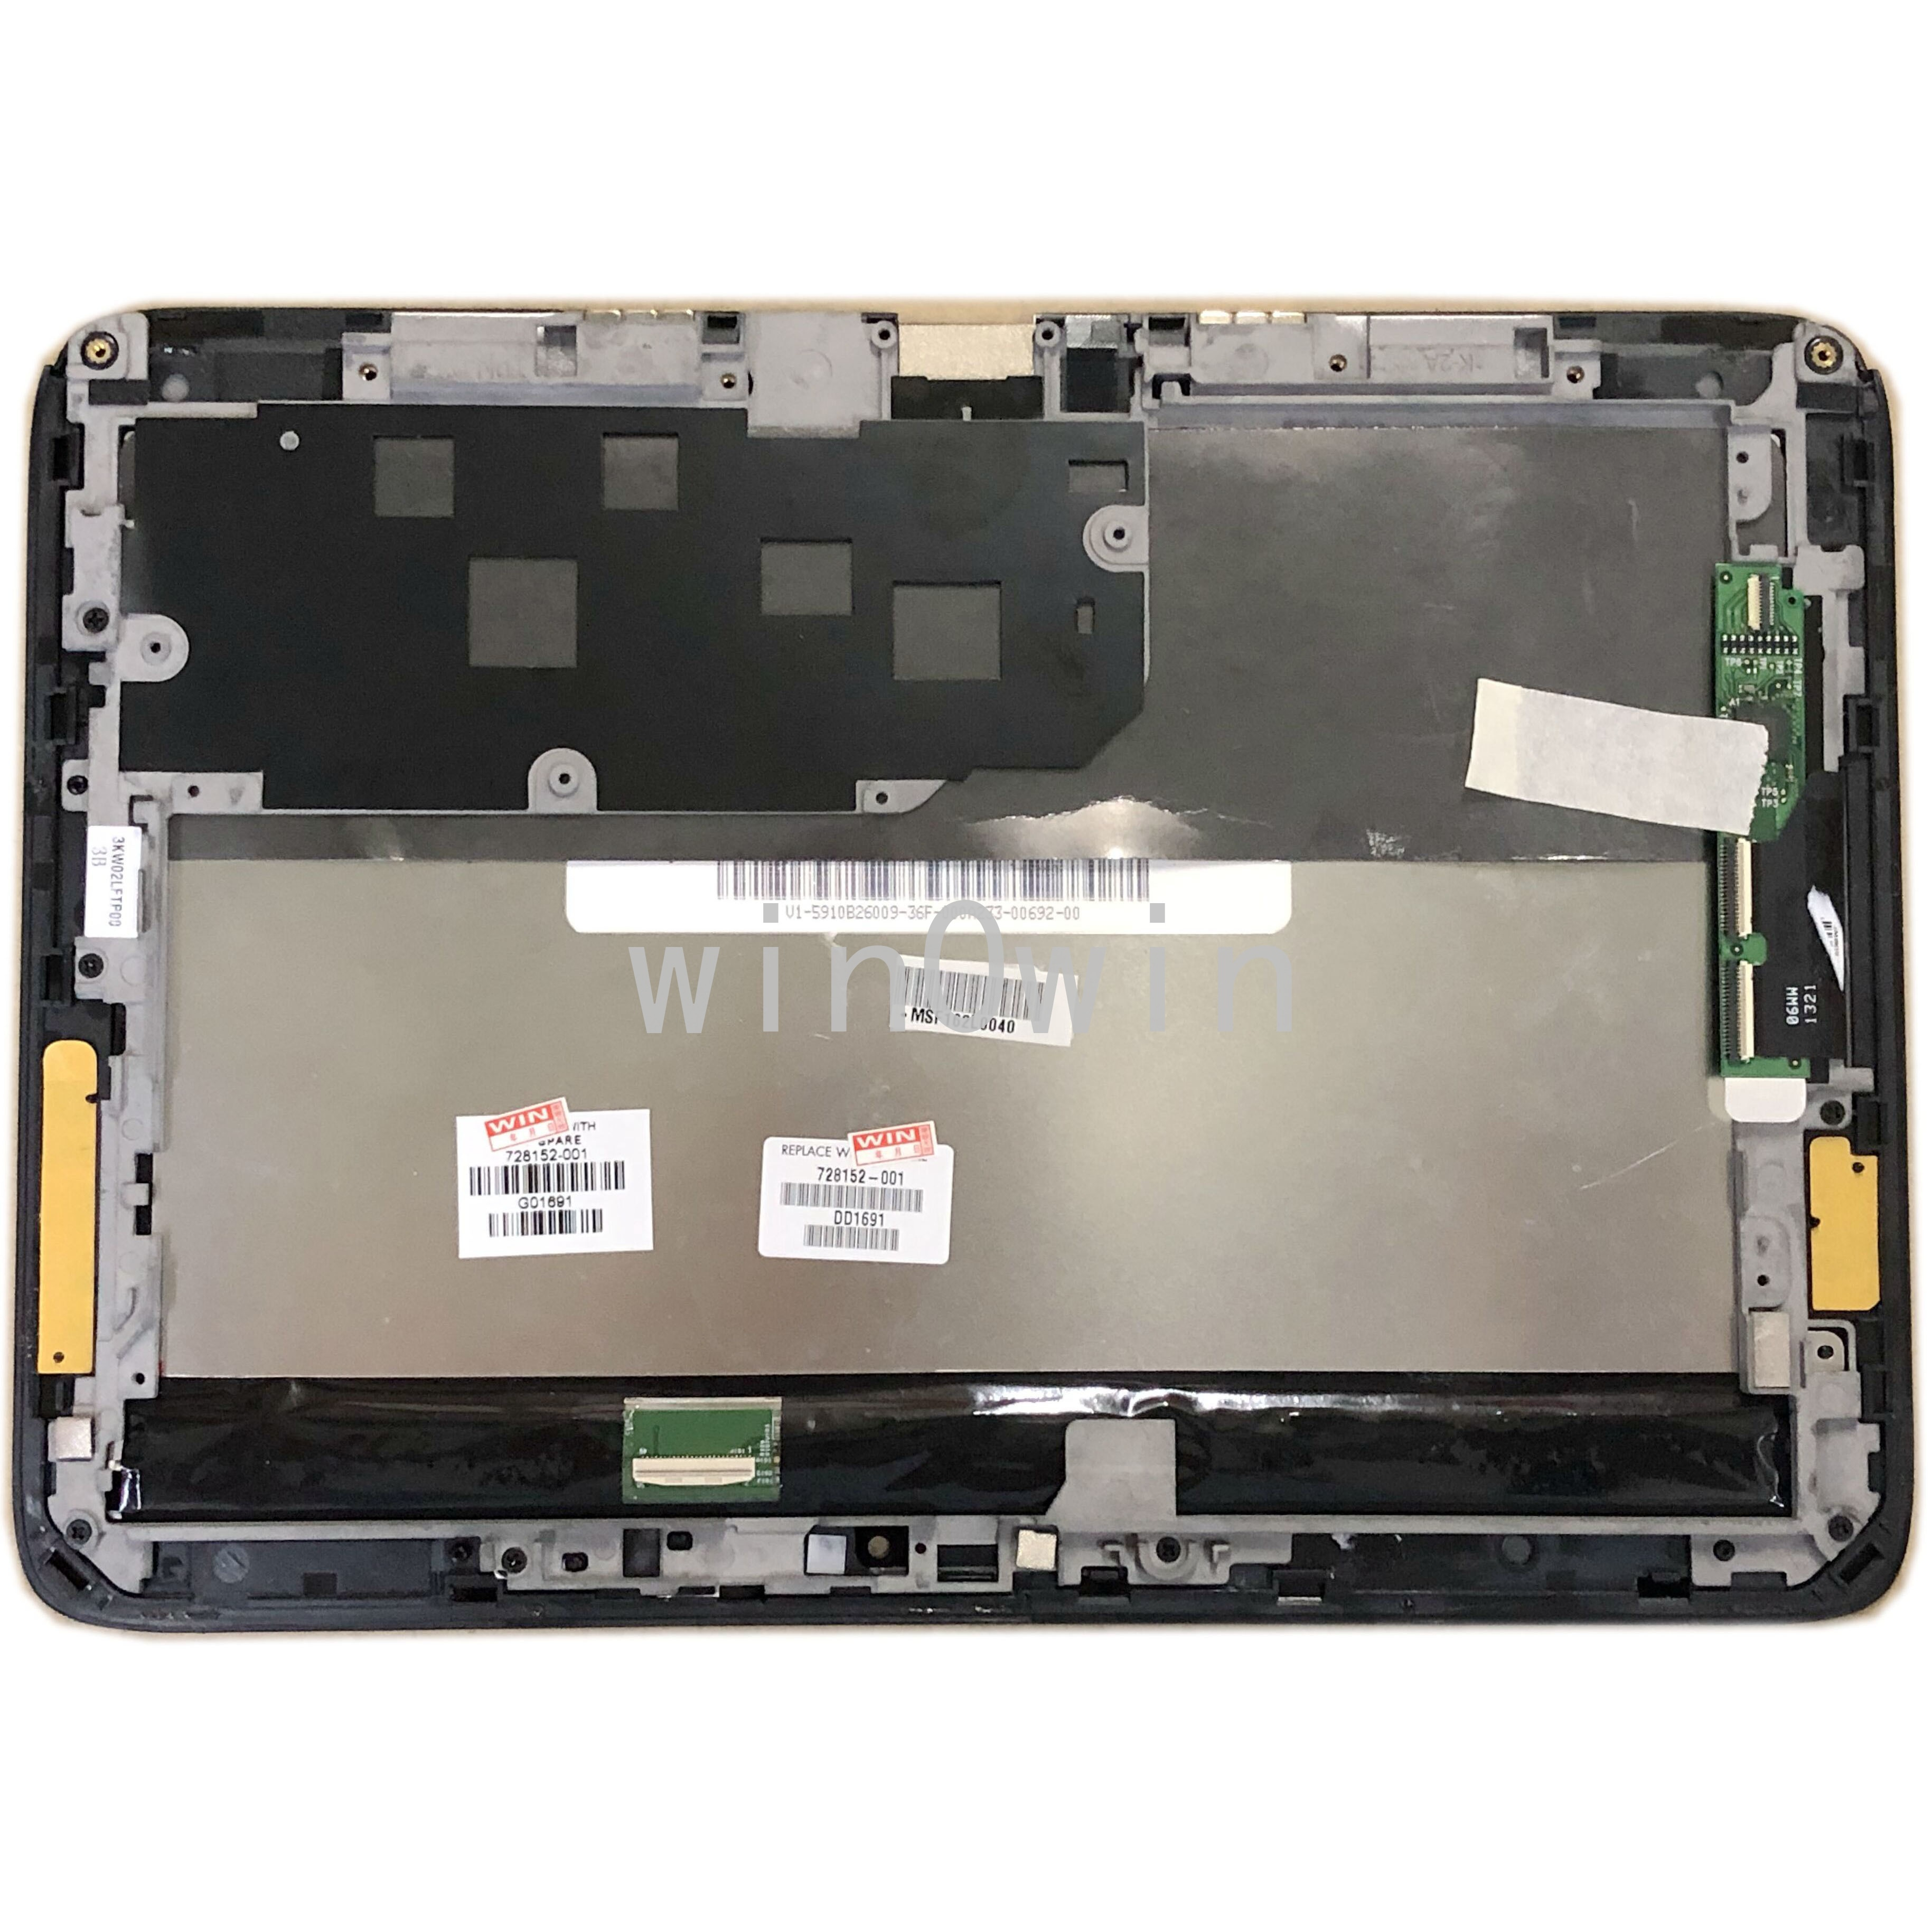 LCD شاشة led تعمل باللمس الزجاج محول الأرقام الجمعية لاستبدال HP SlateBook X2 10-H 10-h011ru 10-h010ss 728152-001